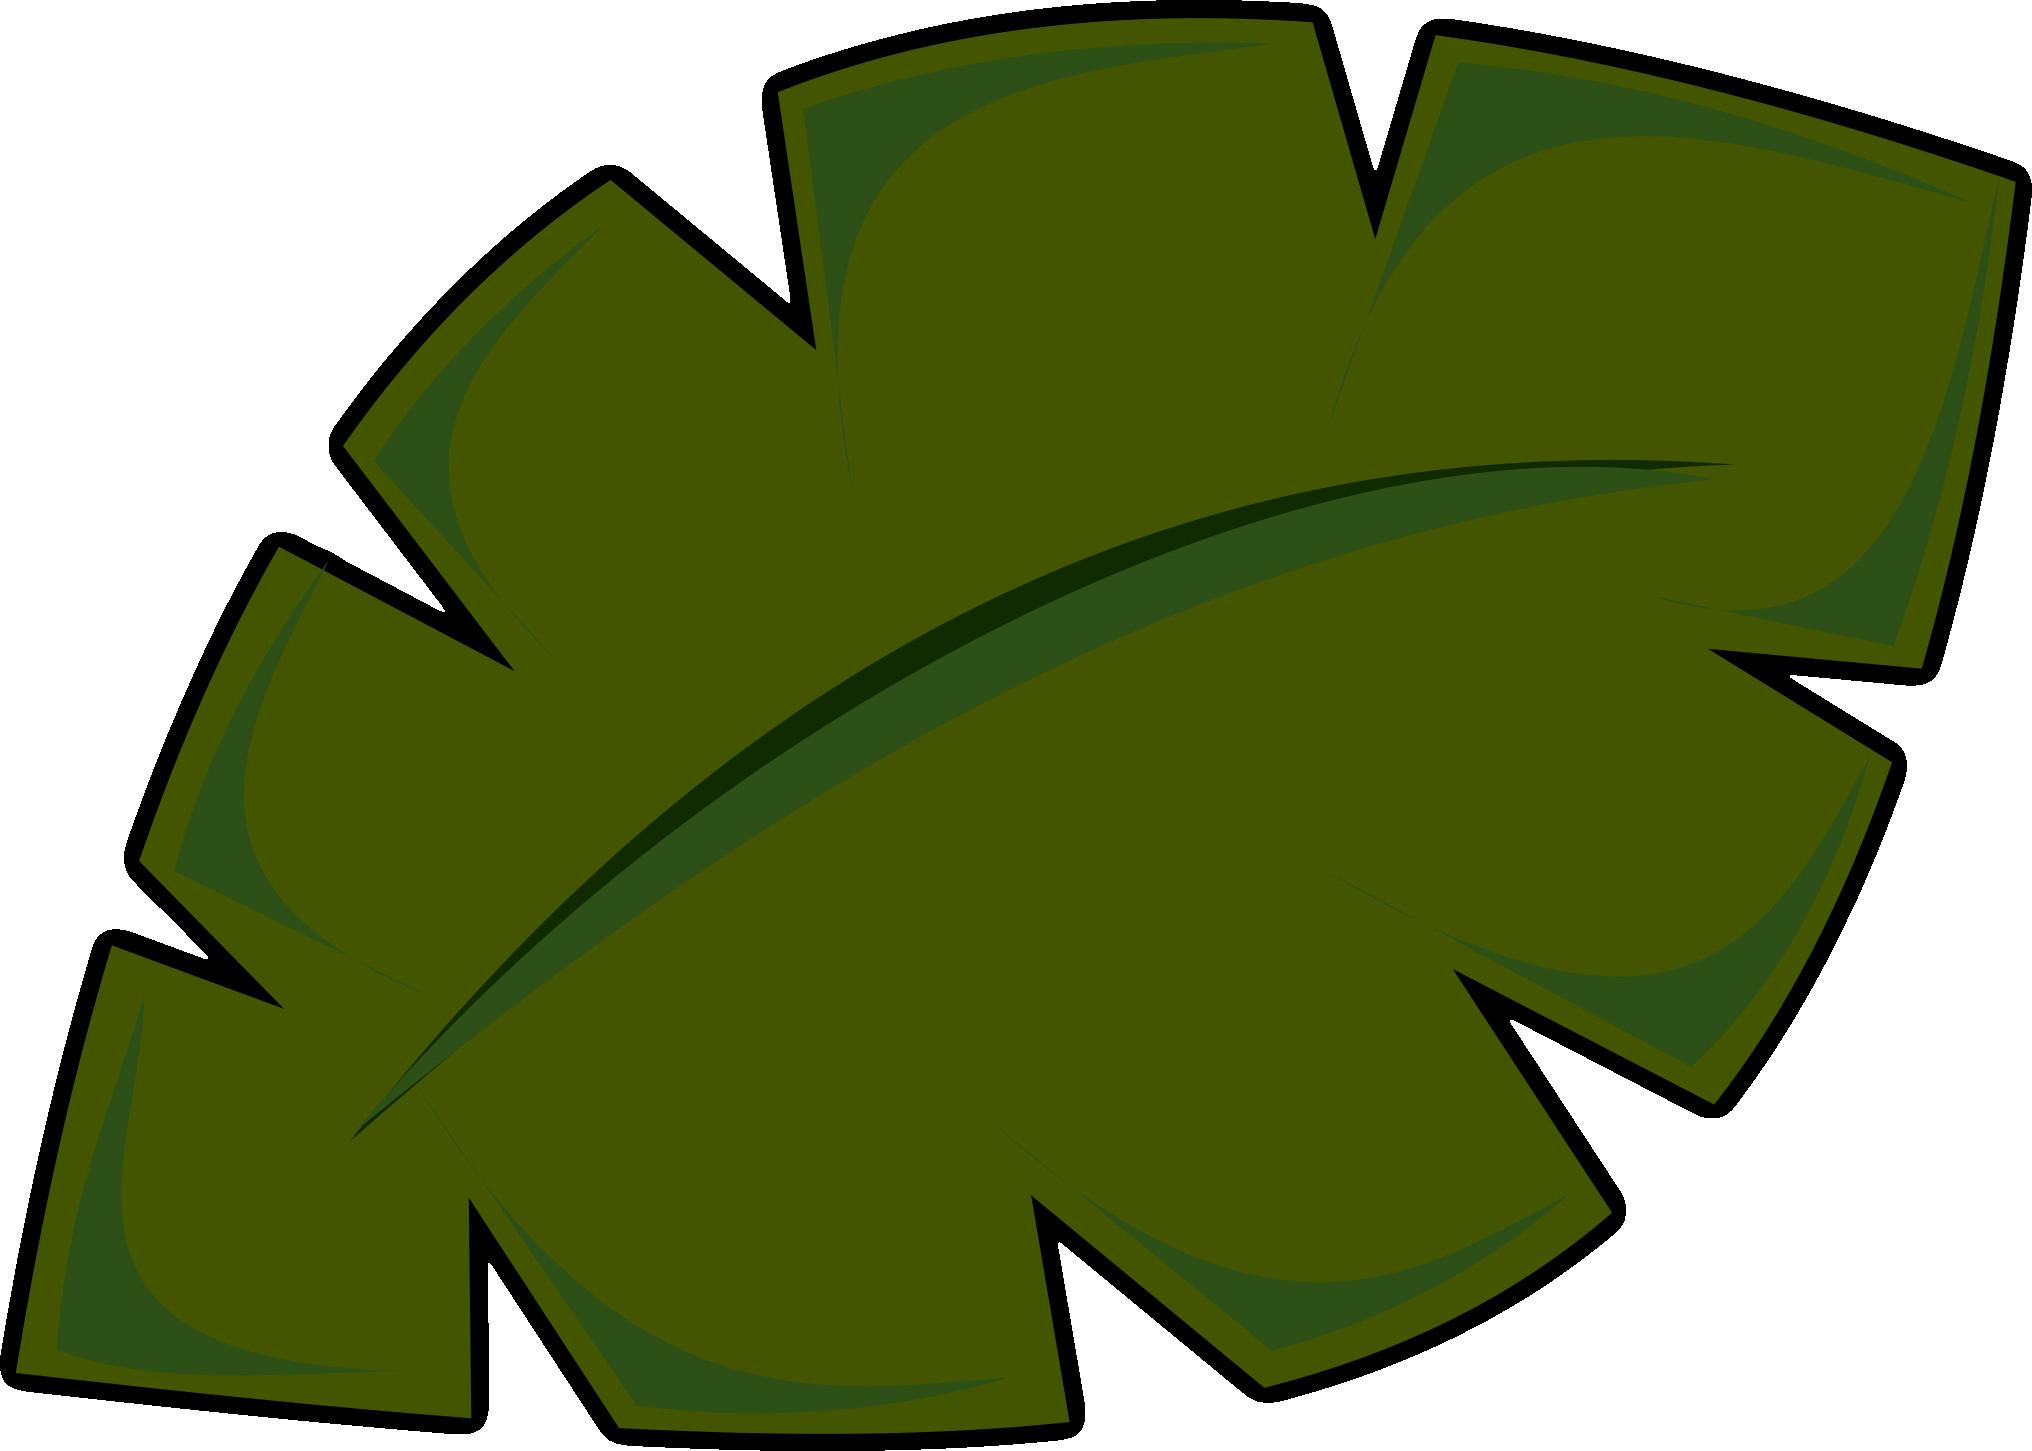 2032x1451 Tropical Rainforest Leaf Jungle Clip Art 2032 1451 Stunning